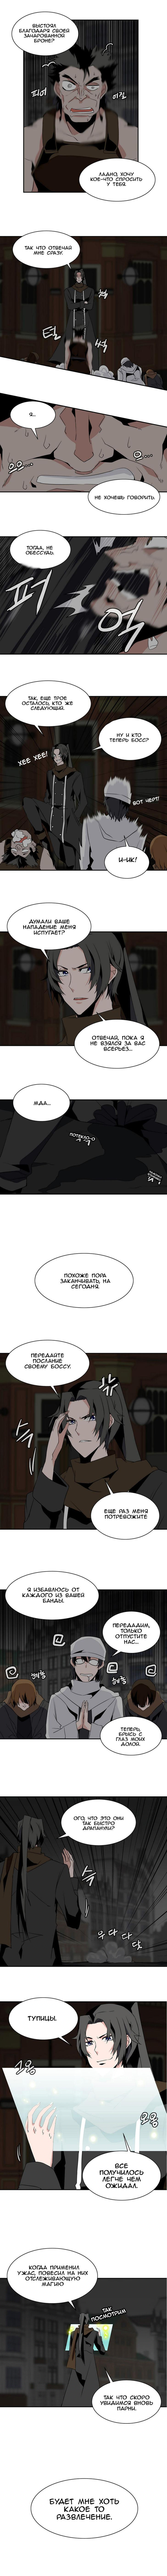 https://r1.ninemanga.com/comics/pic2/48/28784/306586/1469769701485.jpg Page 3